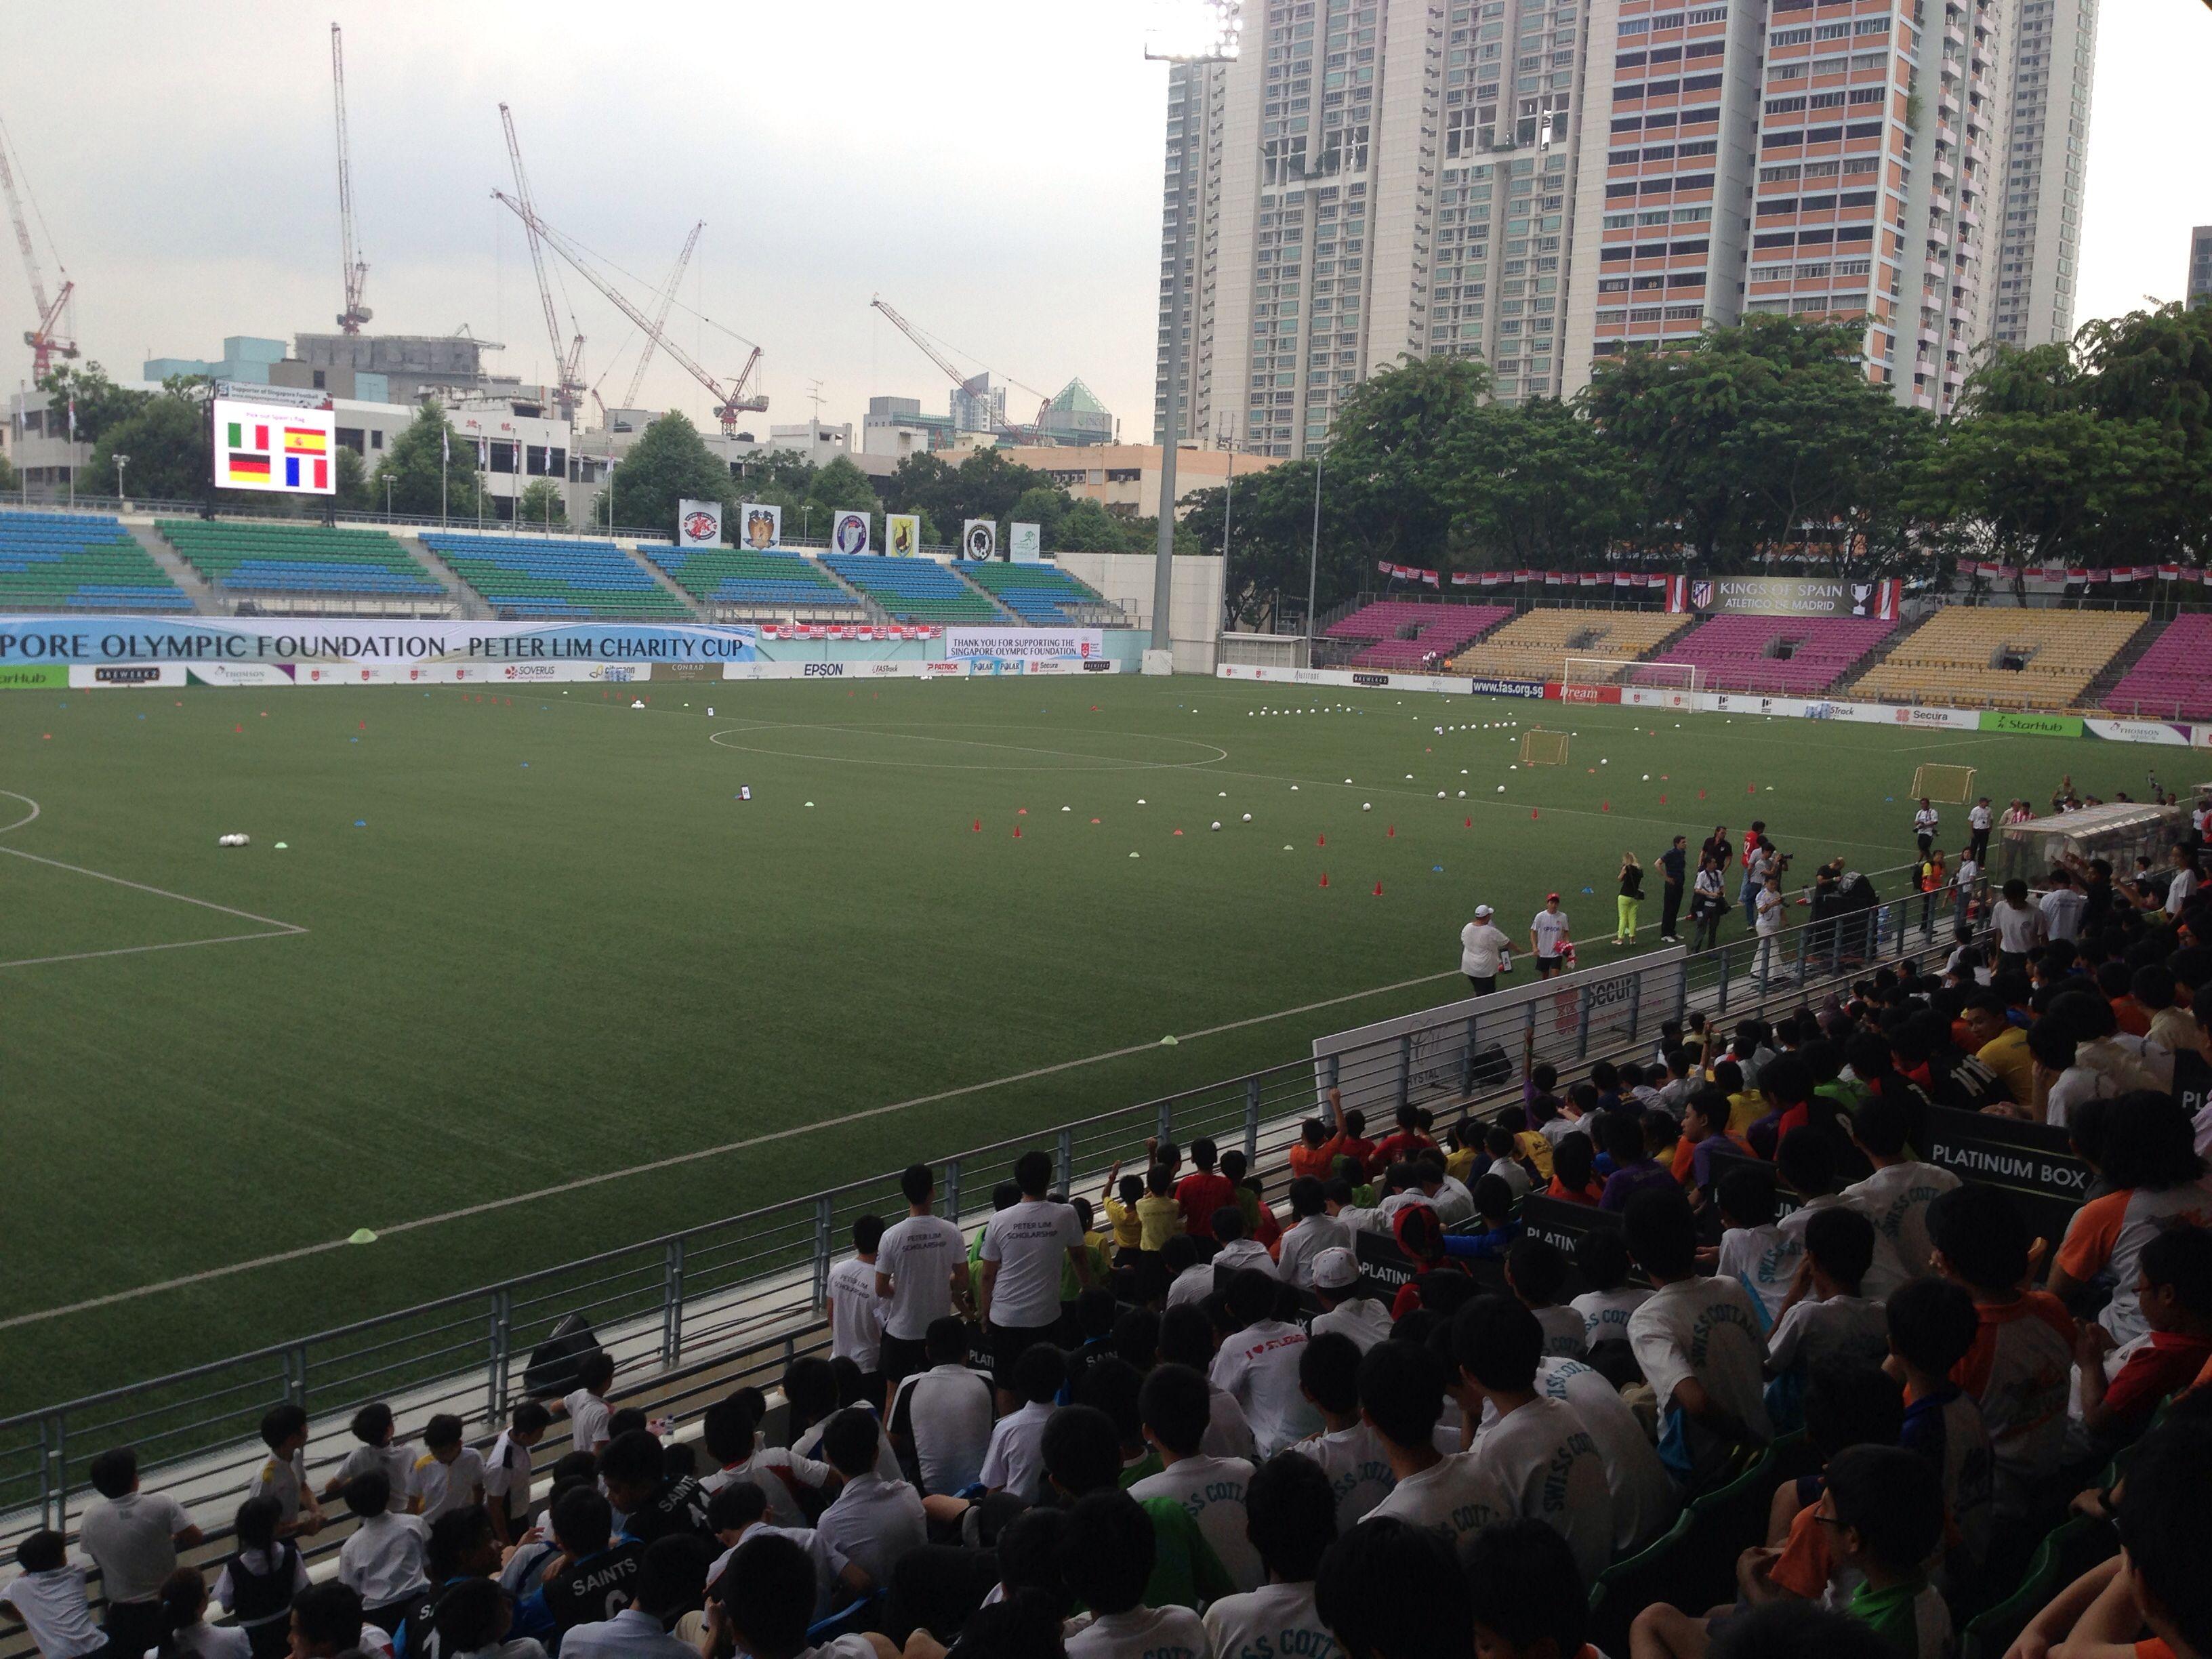 Jalan Besar Stadium Hola Singapore Atletico Madrid V 128 Kids For Charity Supporters Soccer Field Field Football